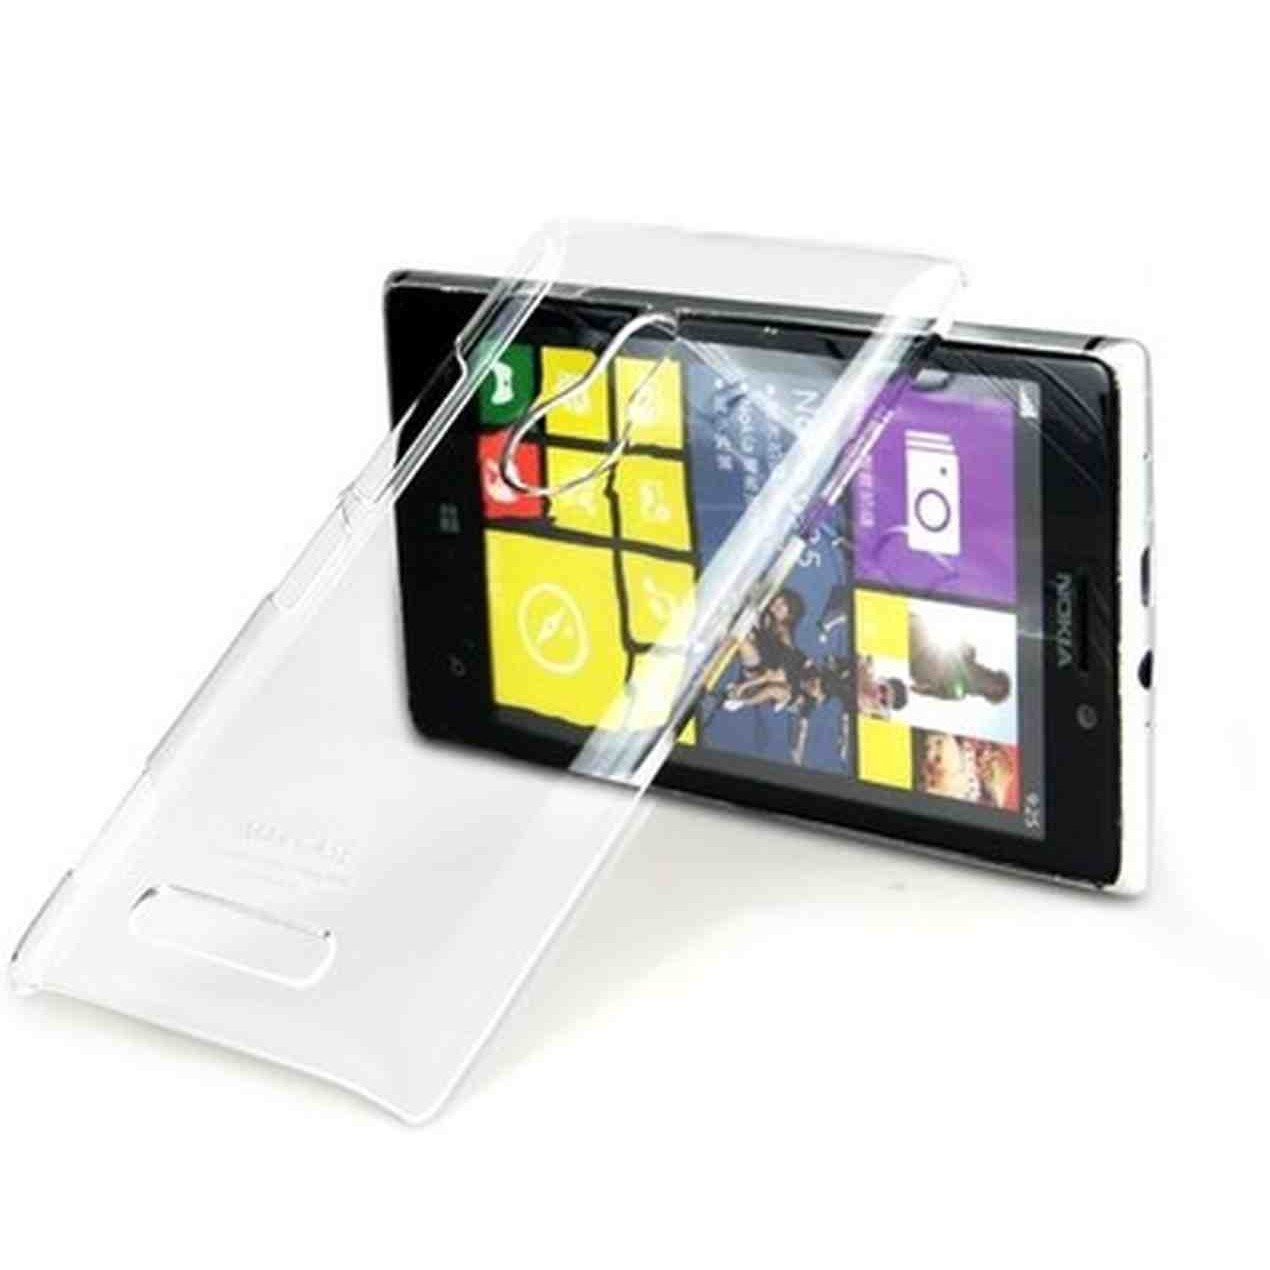 size 40 1d00c b2d31 Transparent Back Case for Samsung Galaxy Tab 2 7.0 8GB WiFi - P3113